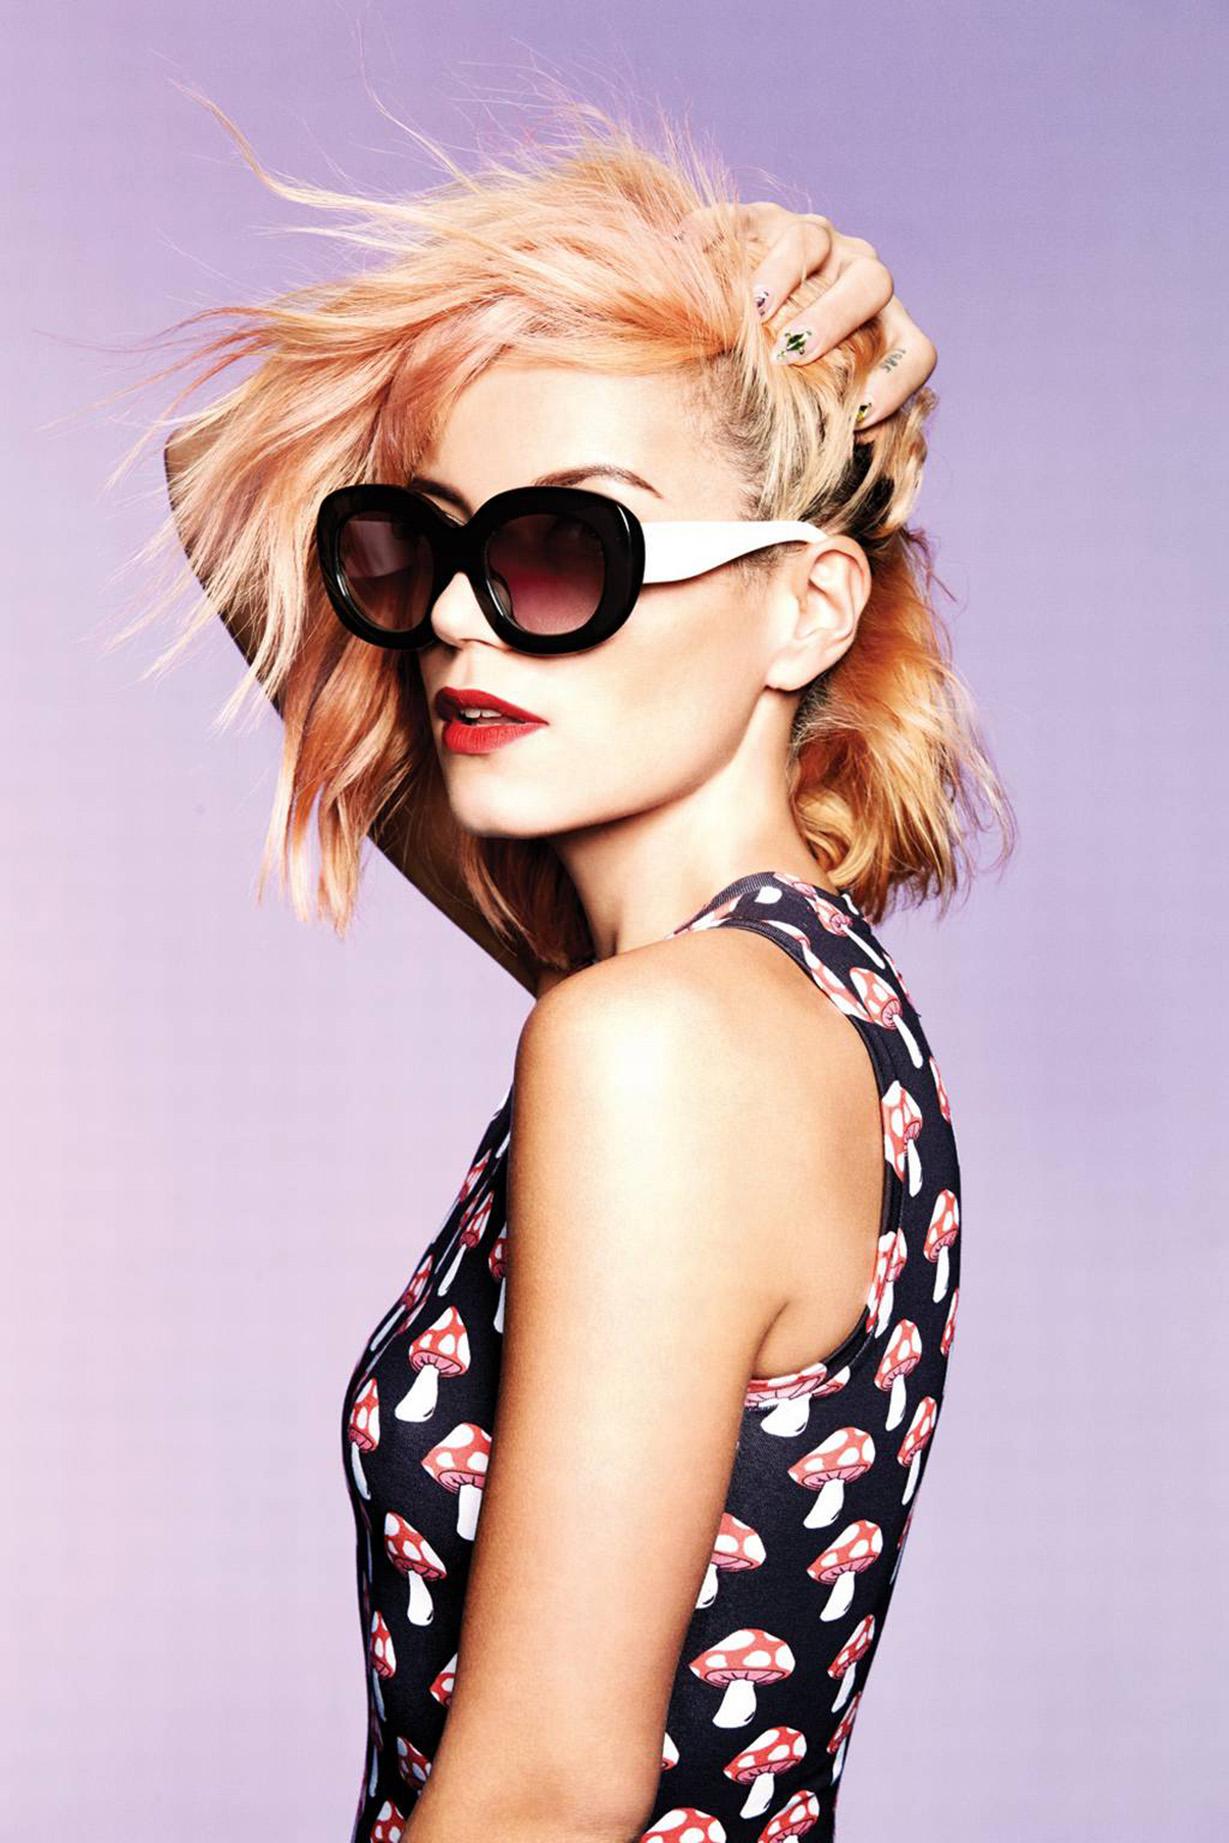 Lily Allen - Henry Holland Eyewear Range (March 2015)